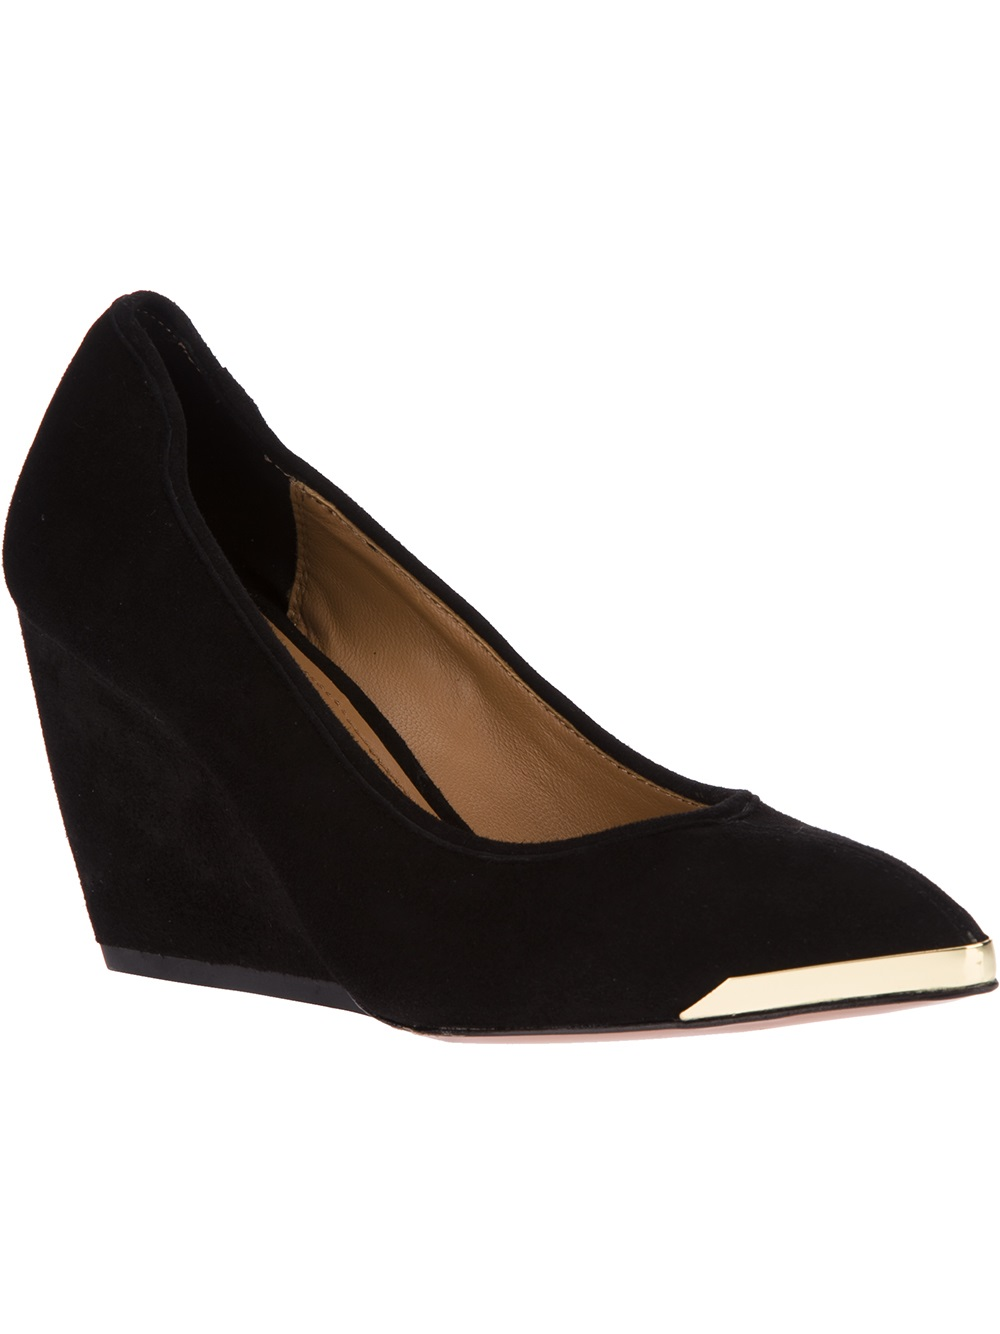 zoe pointed toe wedge in black lyst